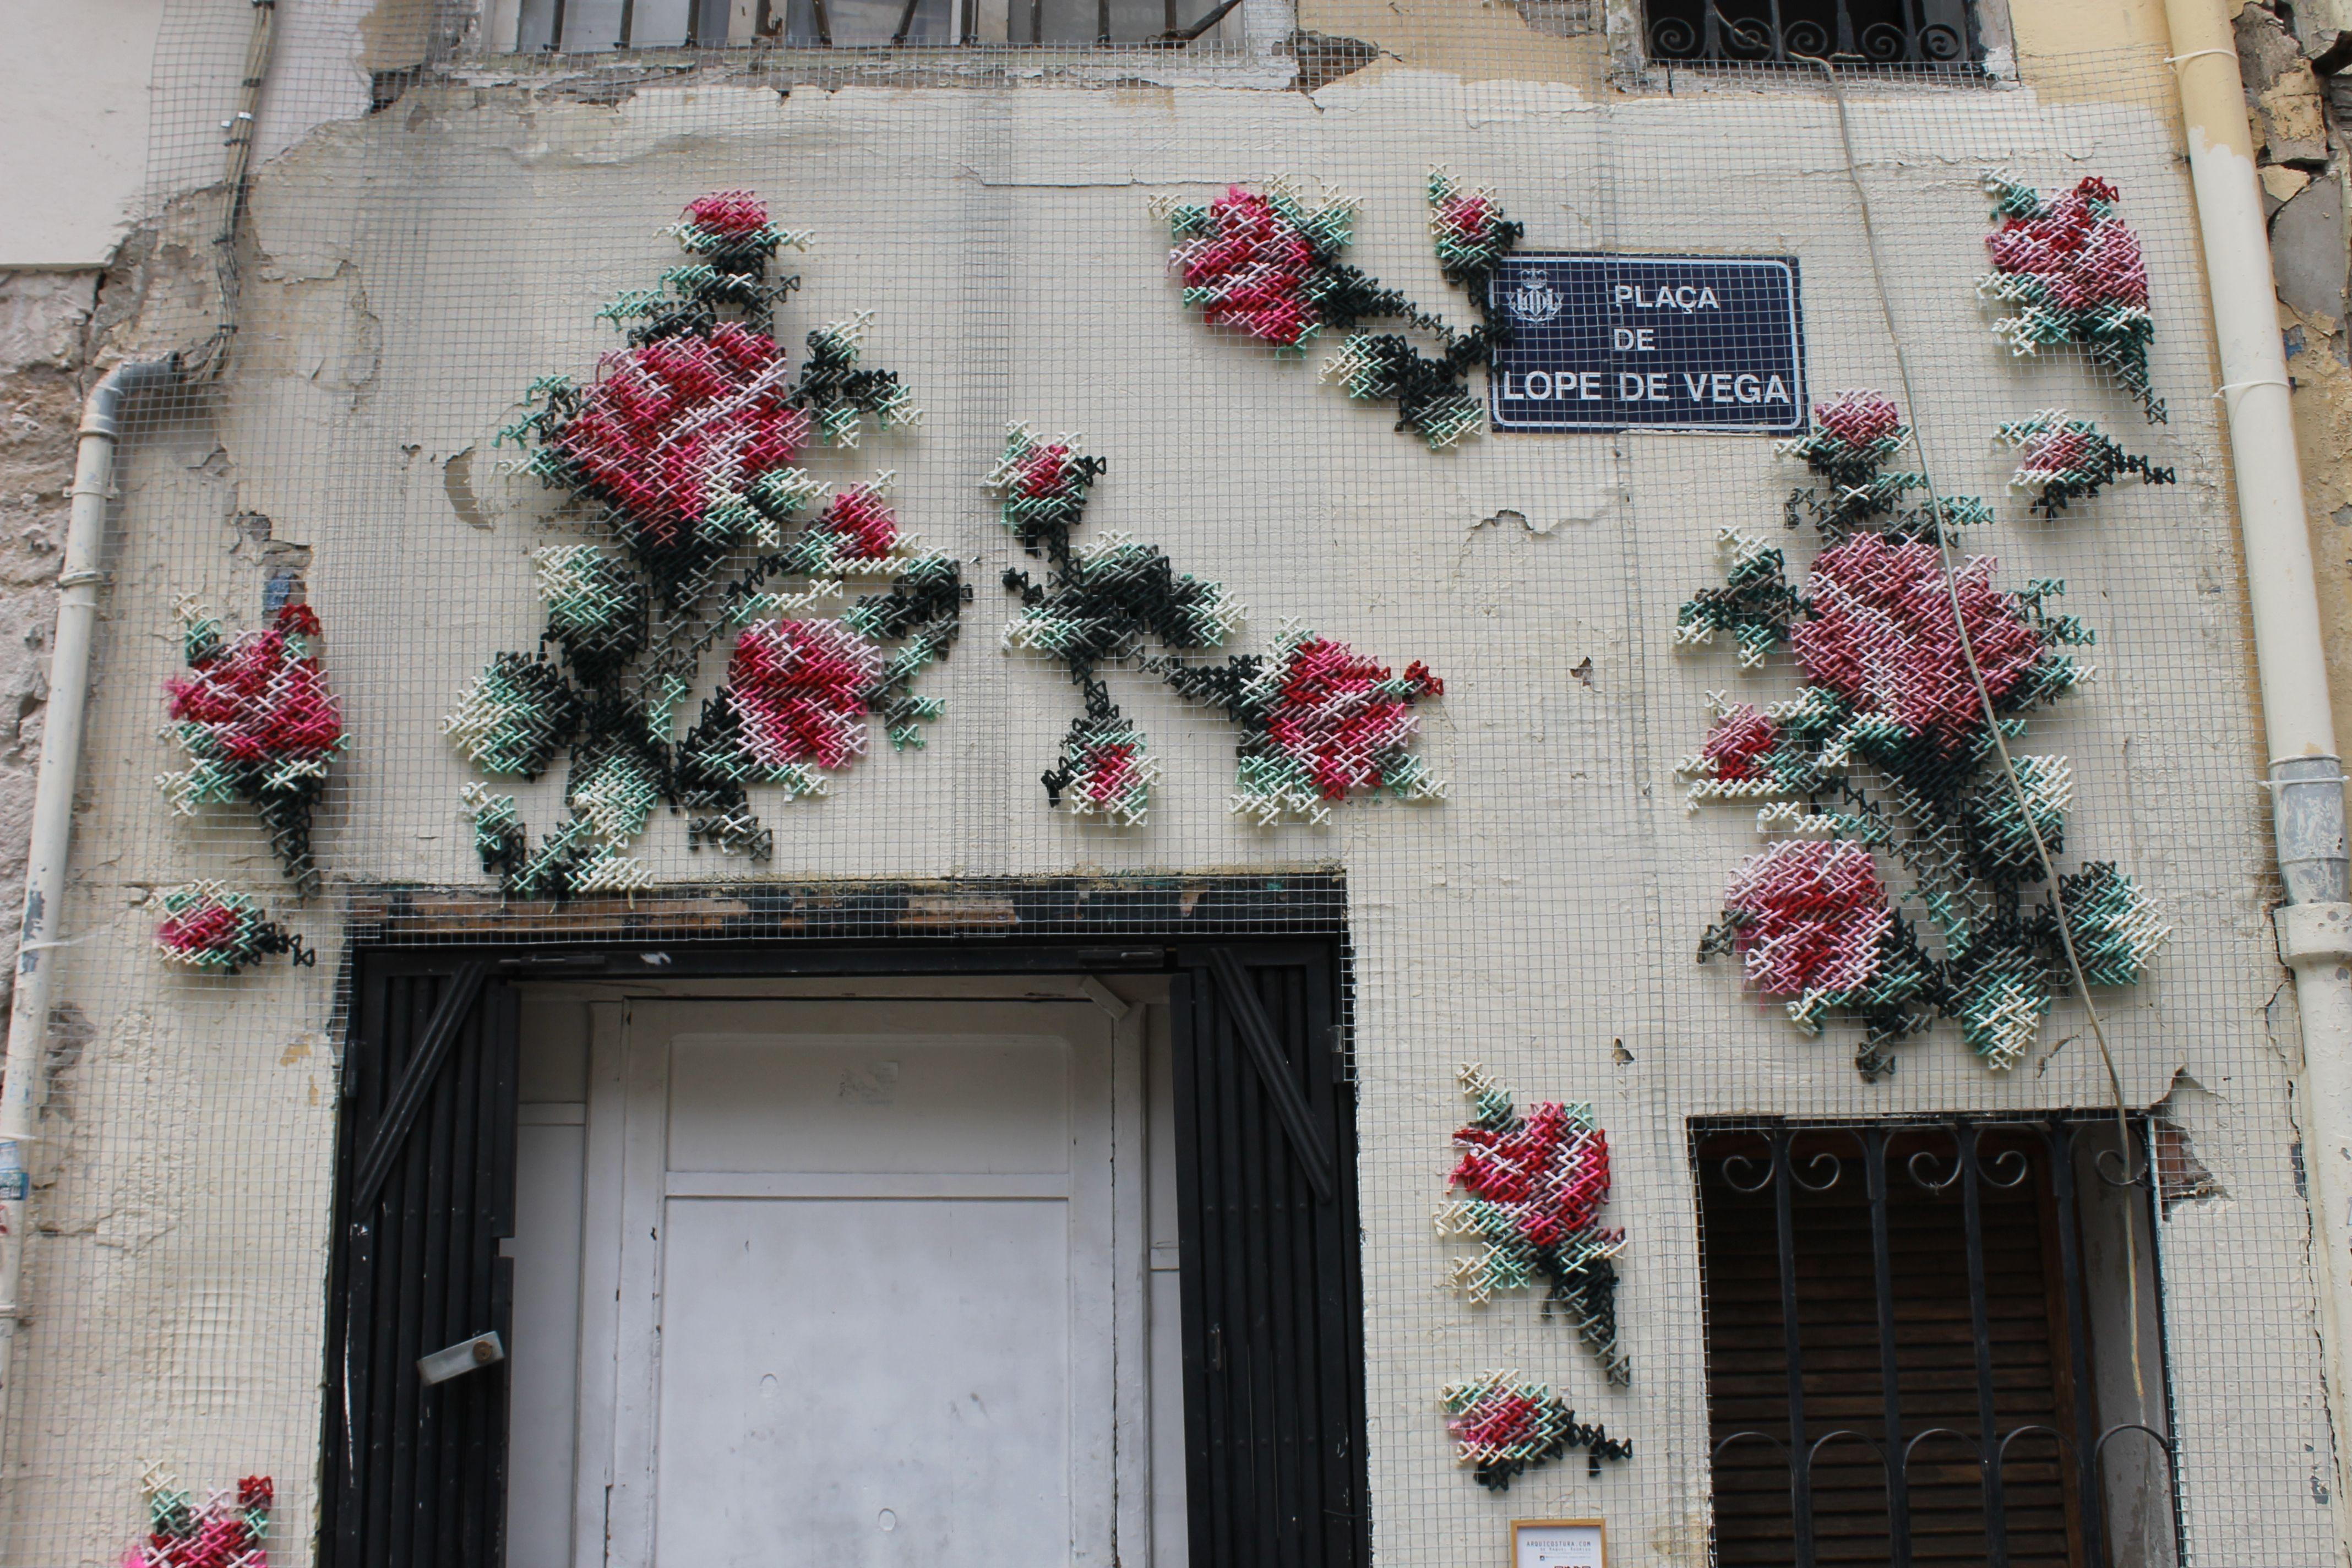 Valencia, Luna Ronkes Agerbeek